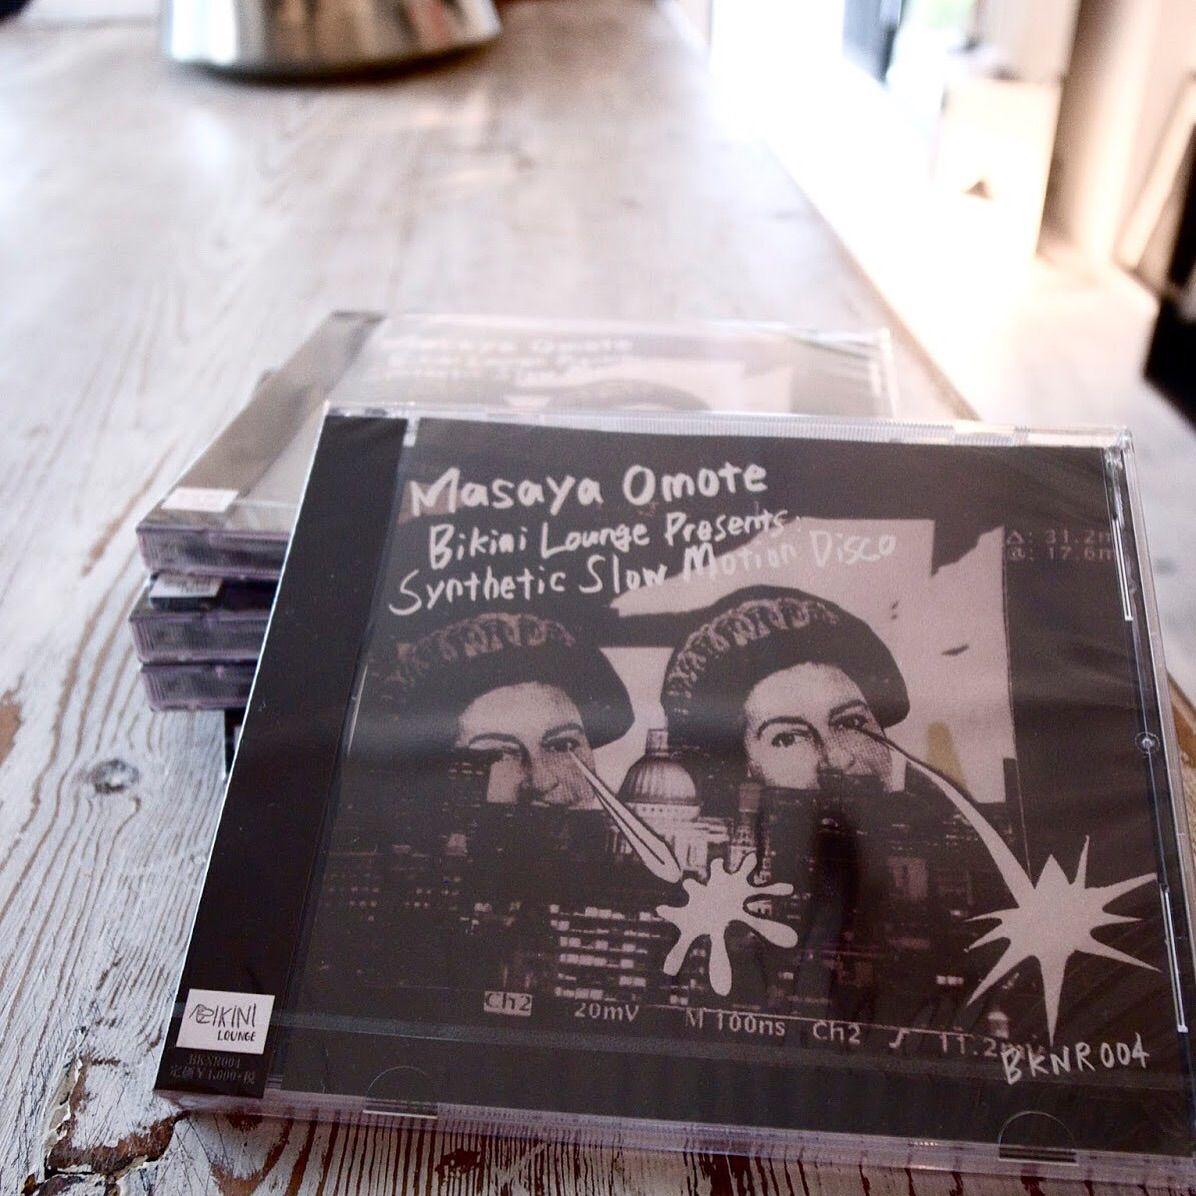 Masaya Omote / BIKINI LOUNGE presents : Synthetic Slow Motion Disco (MIX-CD)